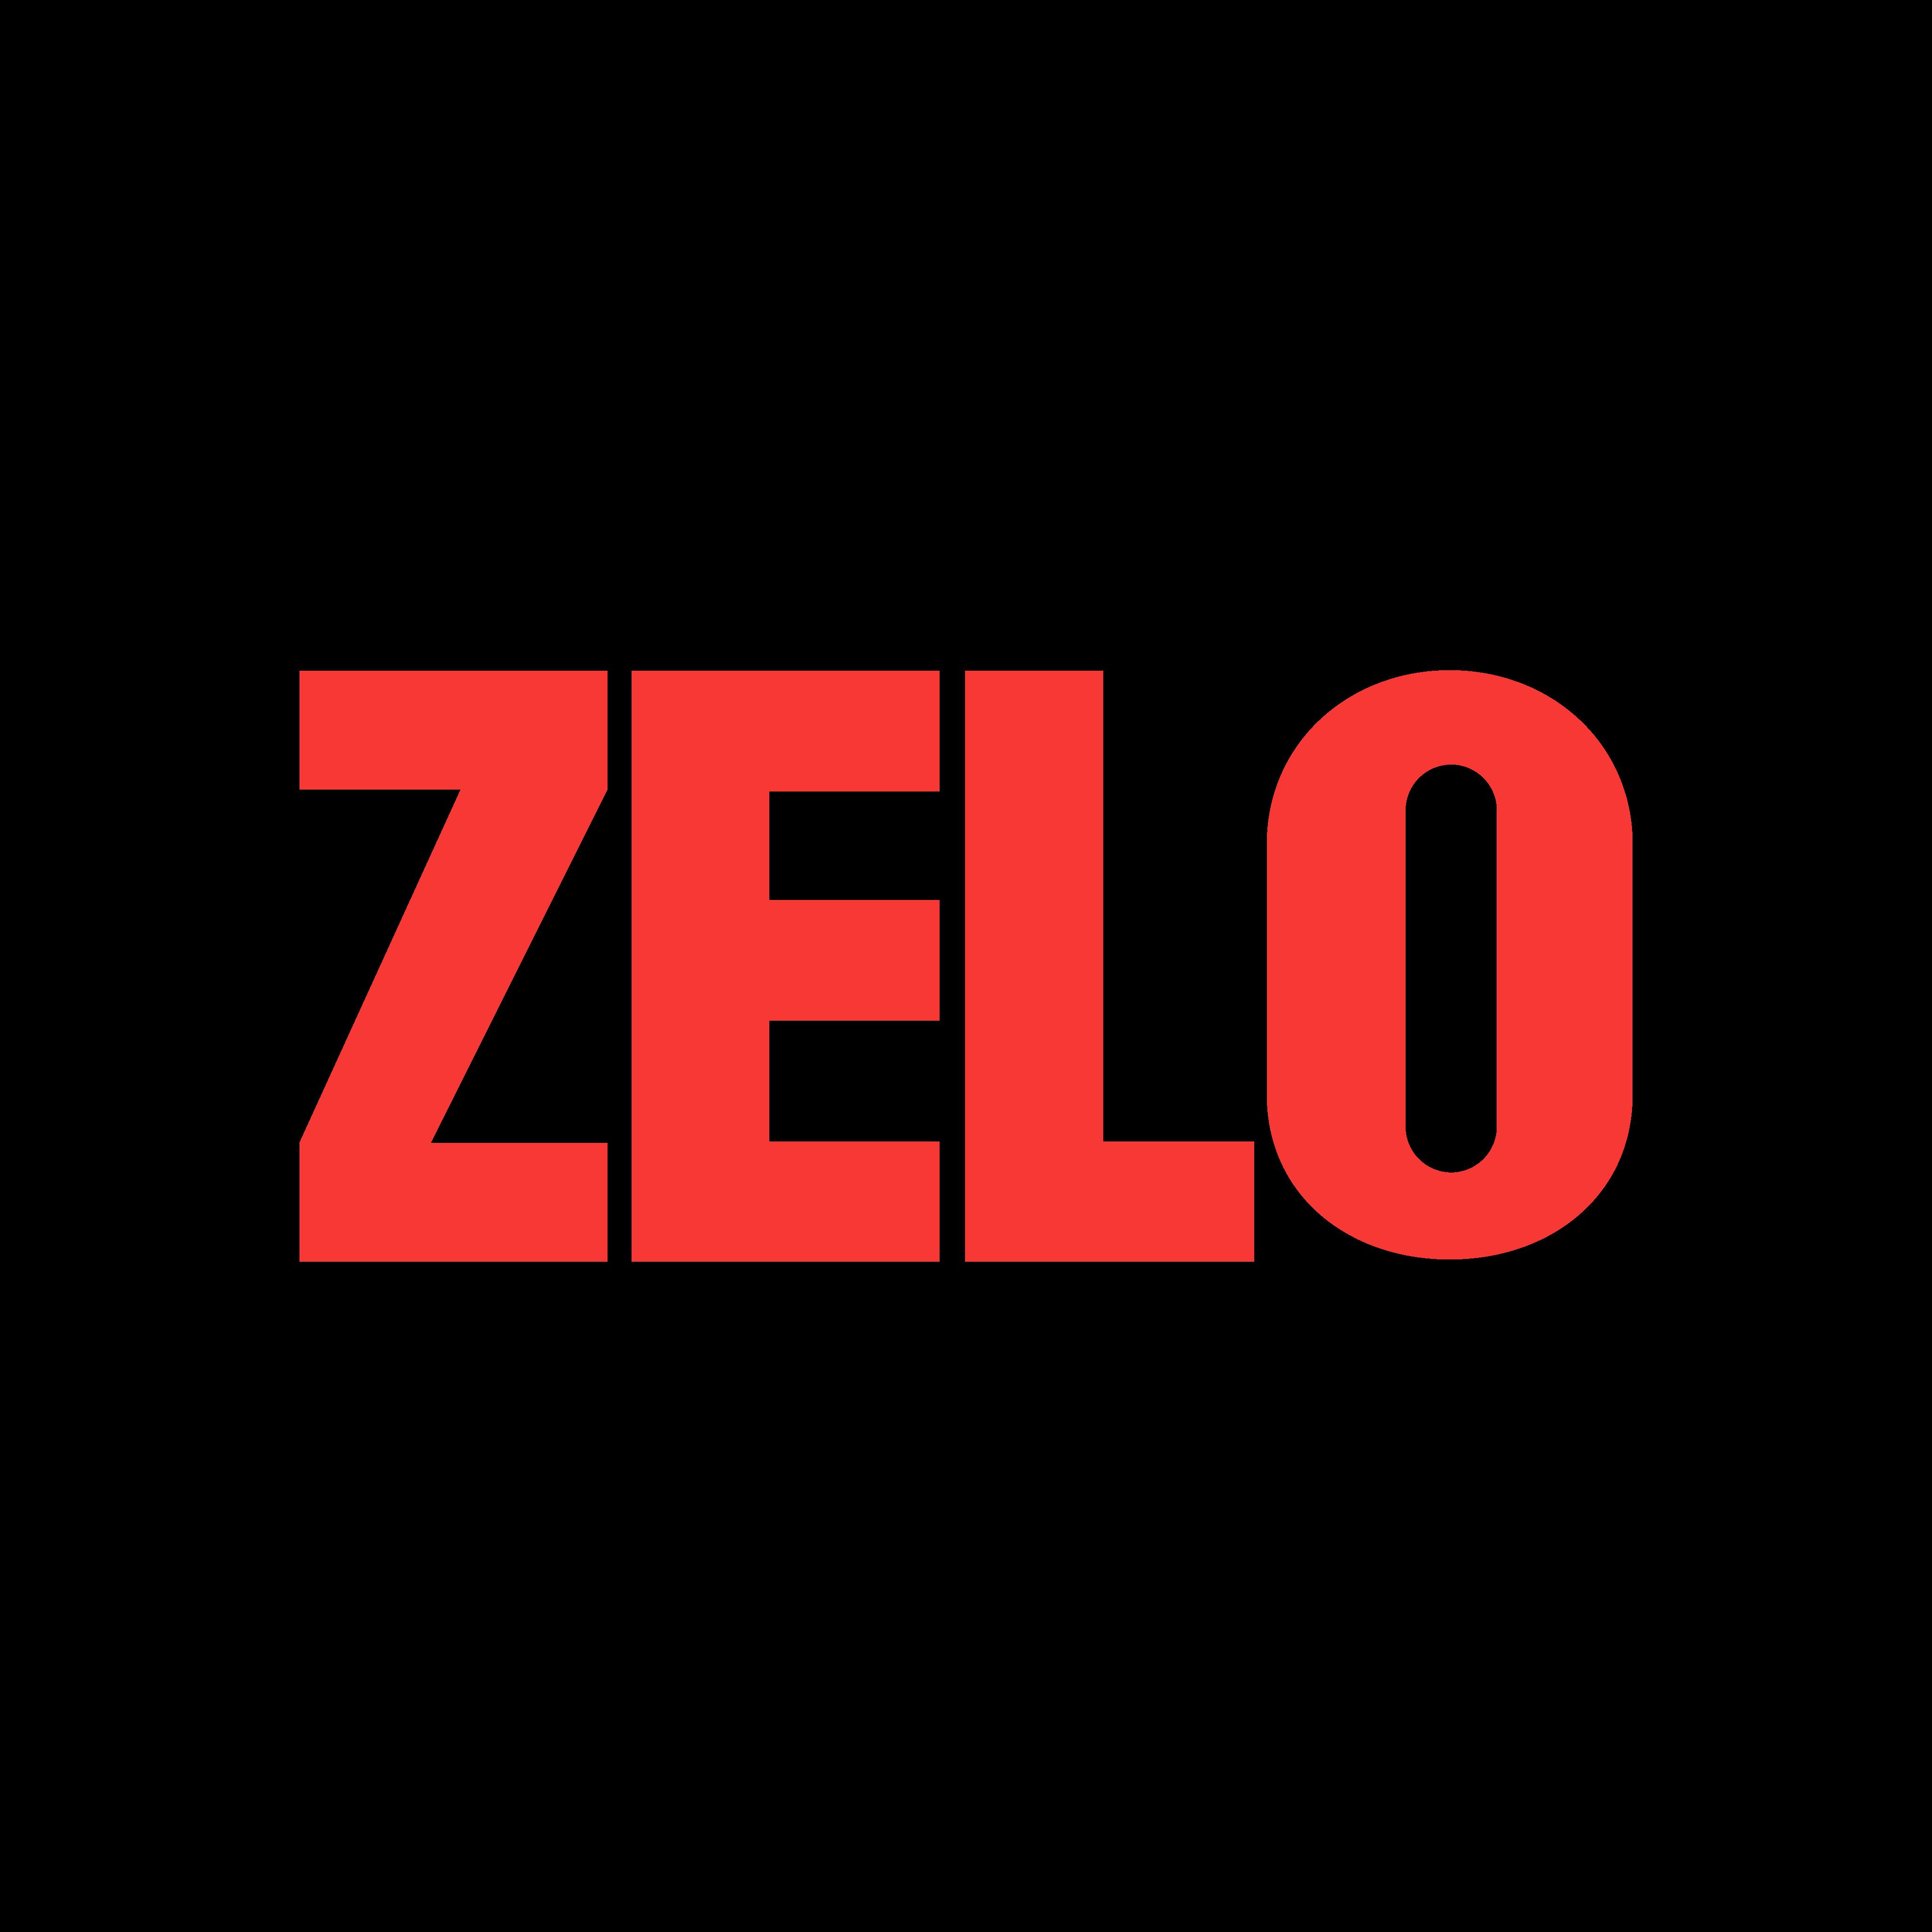 zelo logo 0 - Zelo Logo